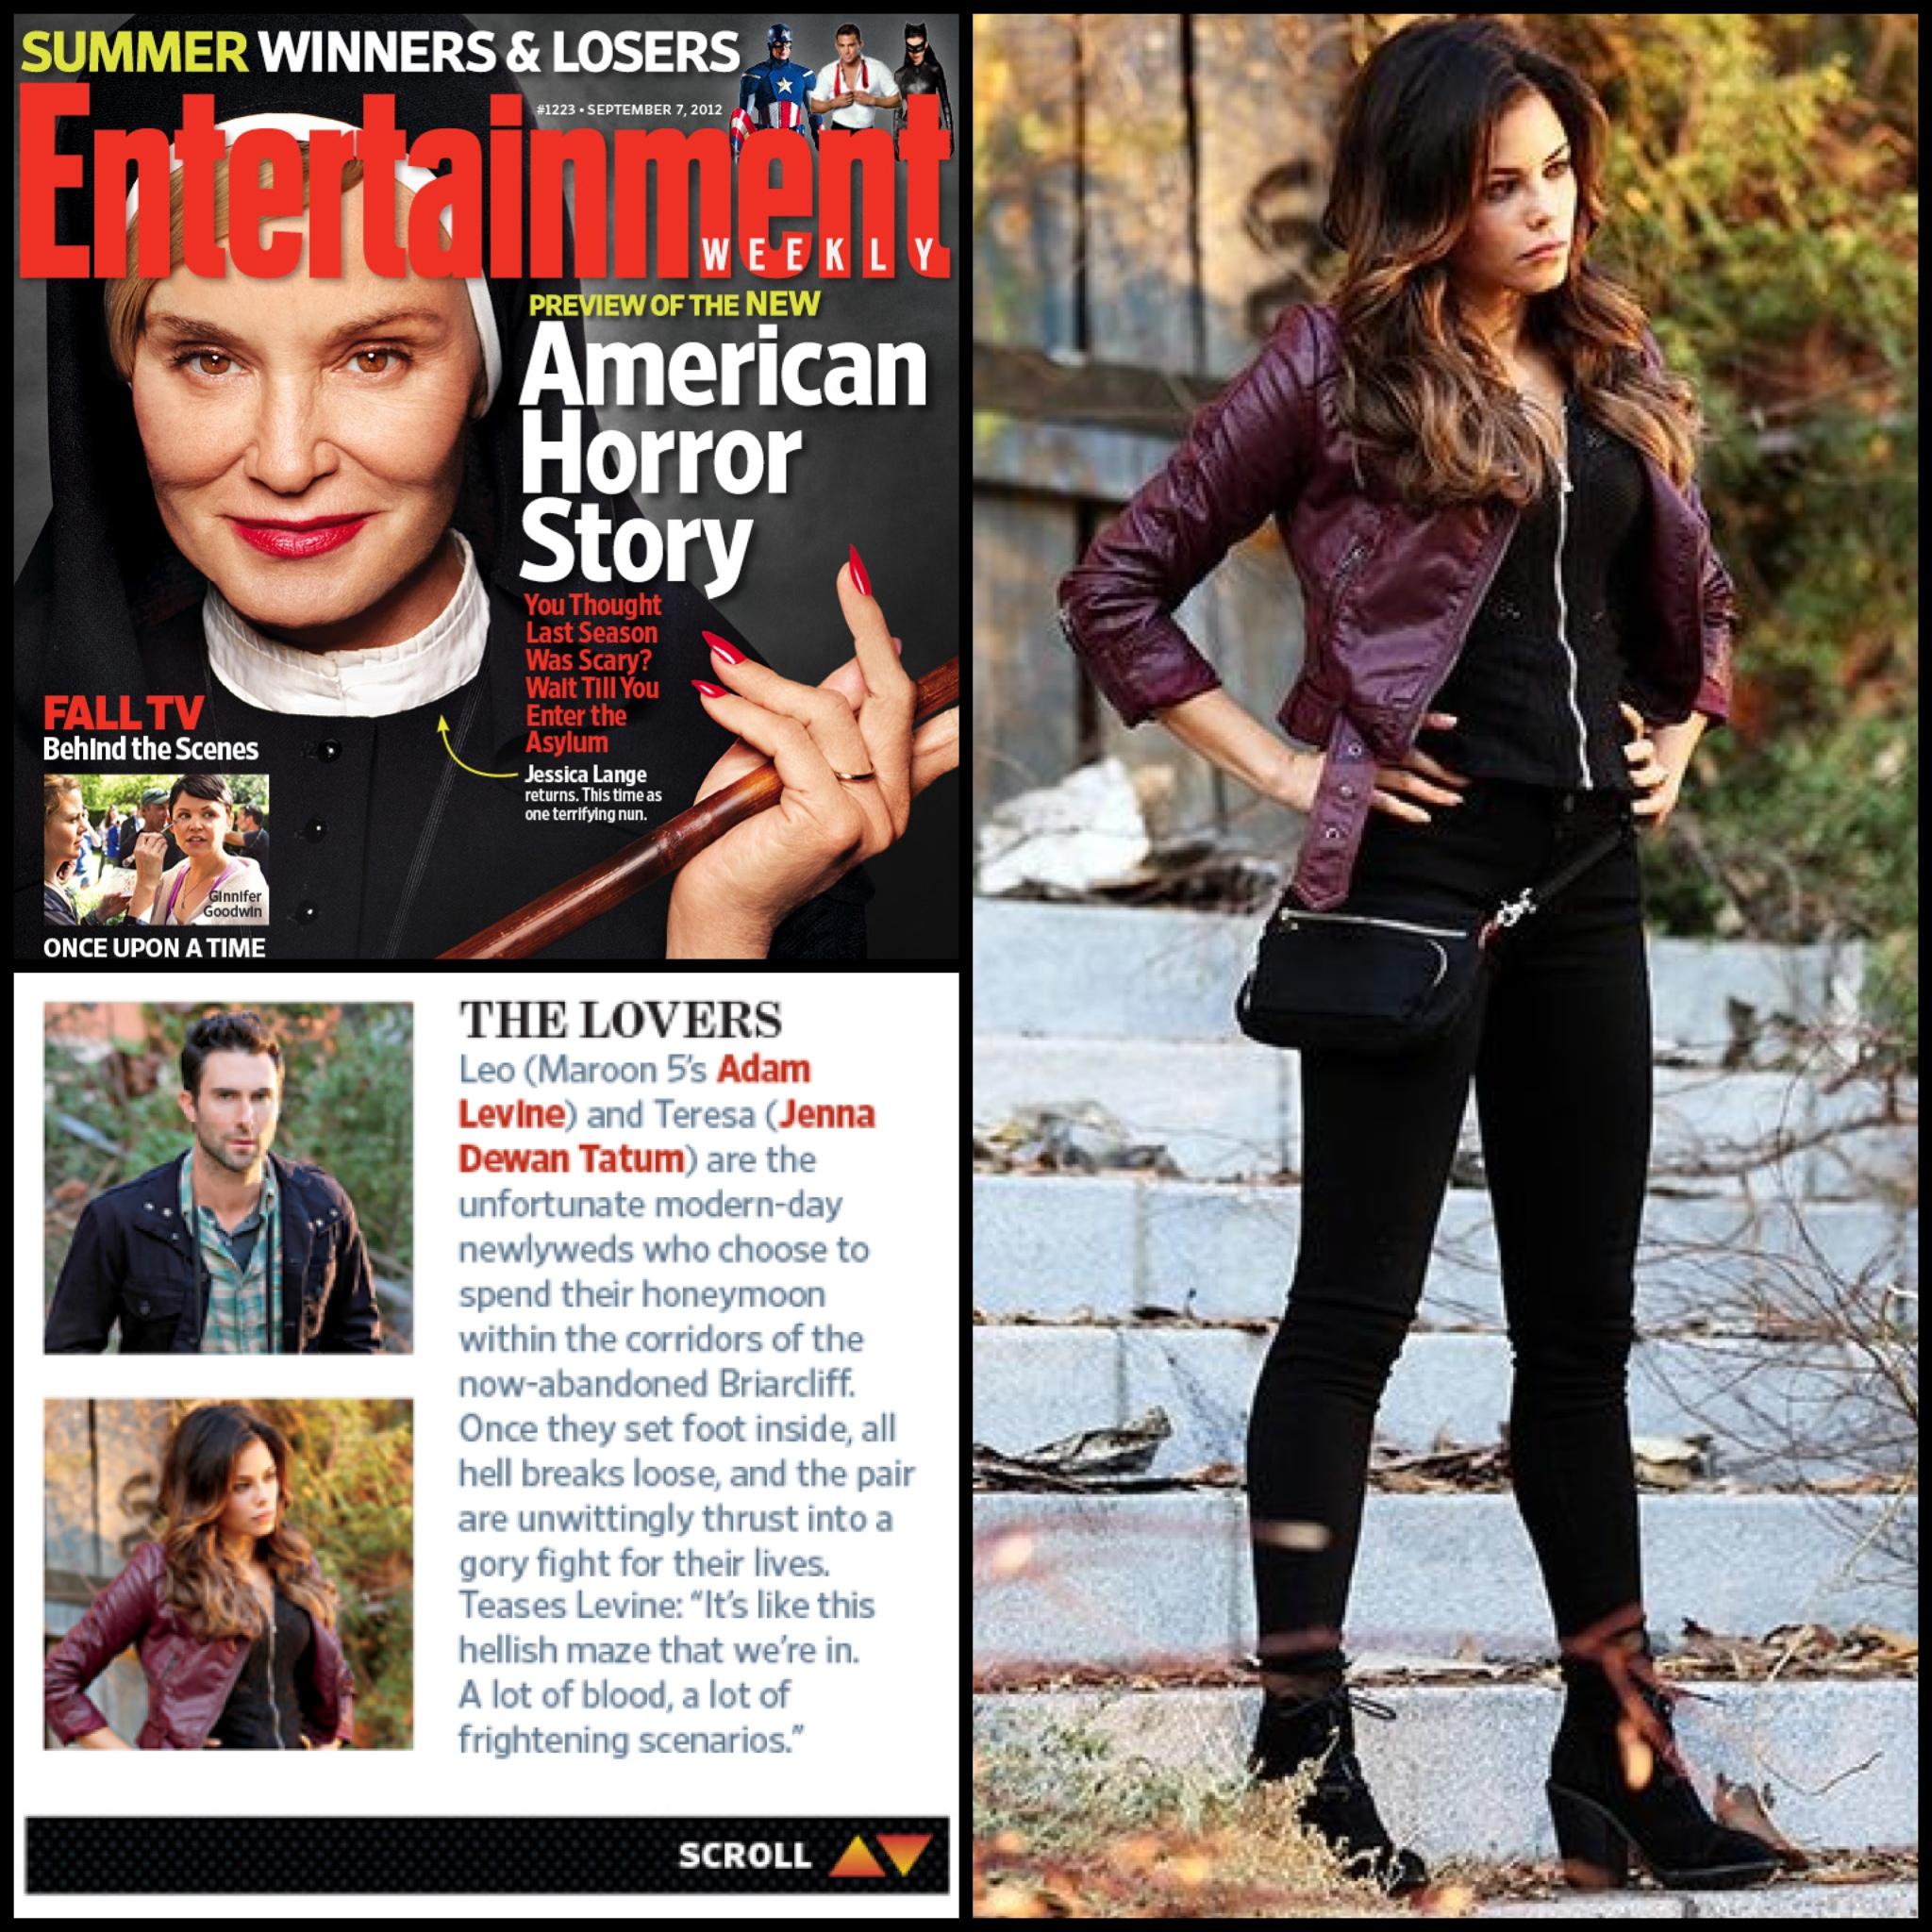 Jenna Dewan-Tatum - American Horror Story